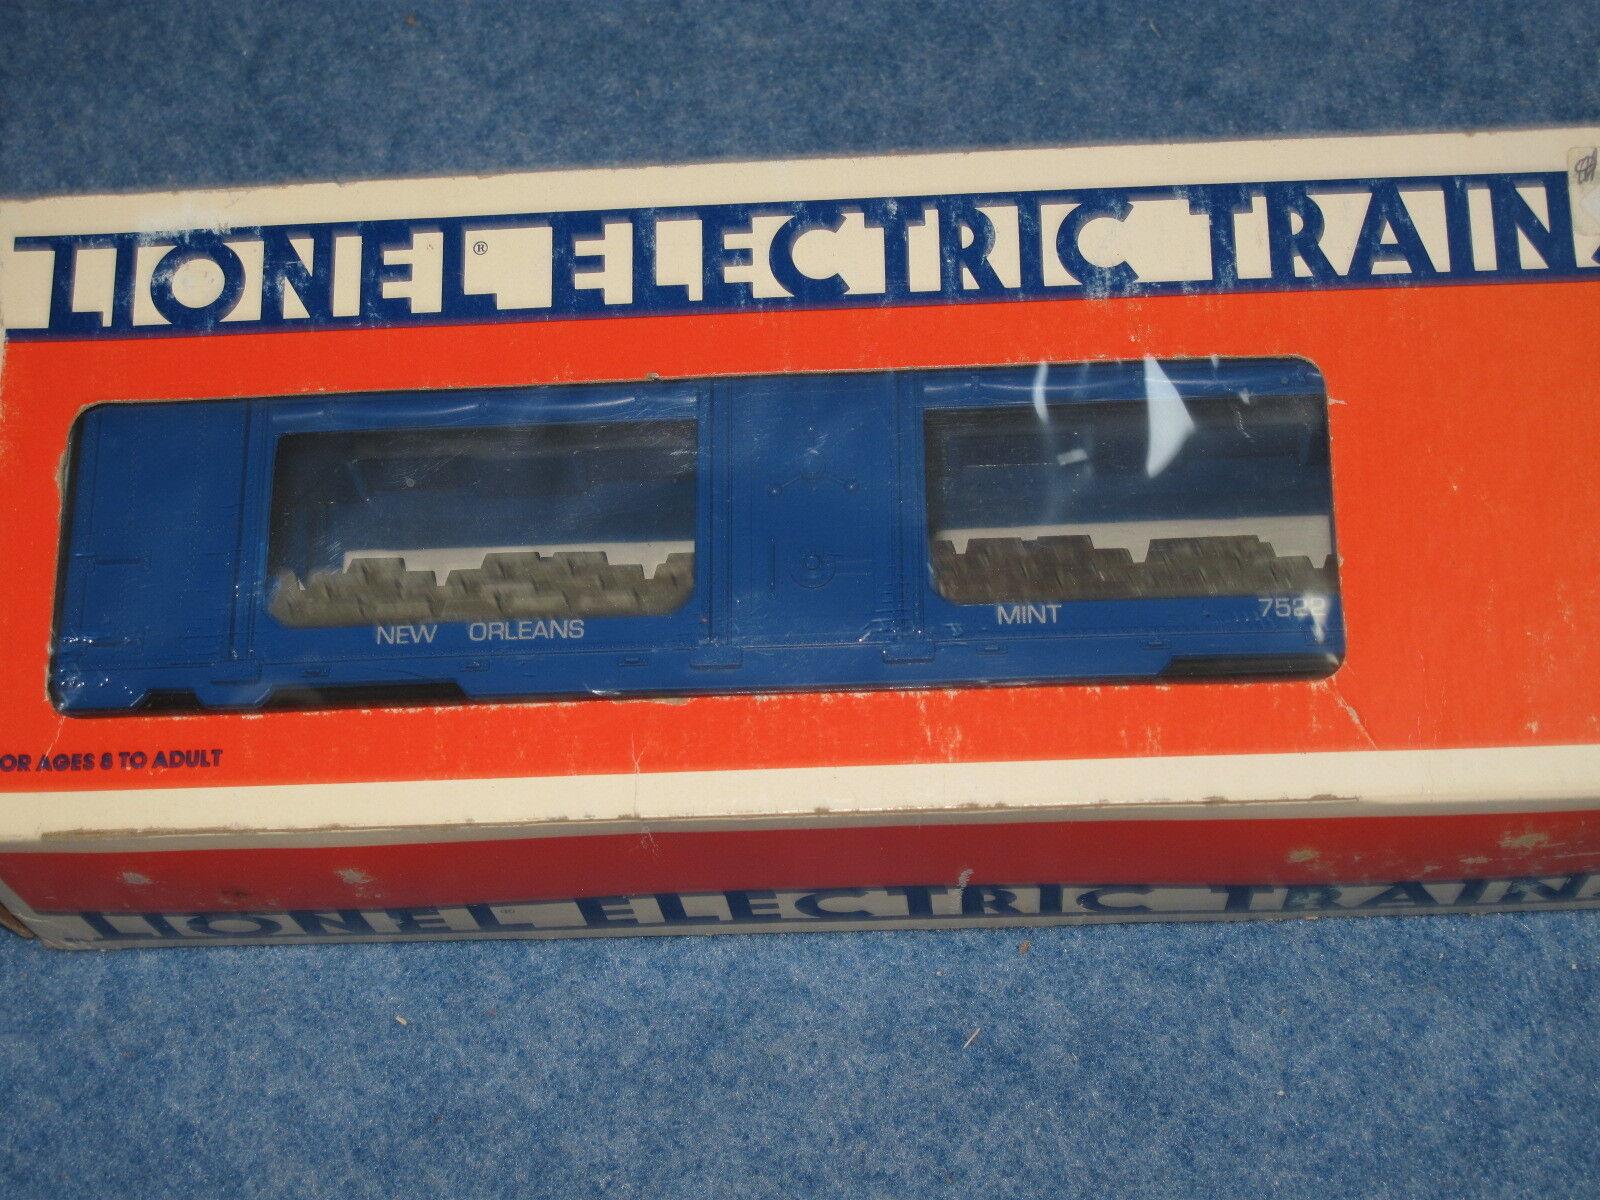 1984 Lionel 6-7522 Nuovo Orleans Mint Car L1280